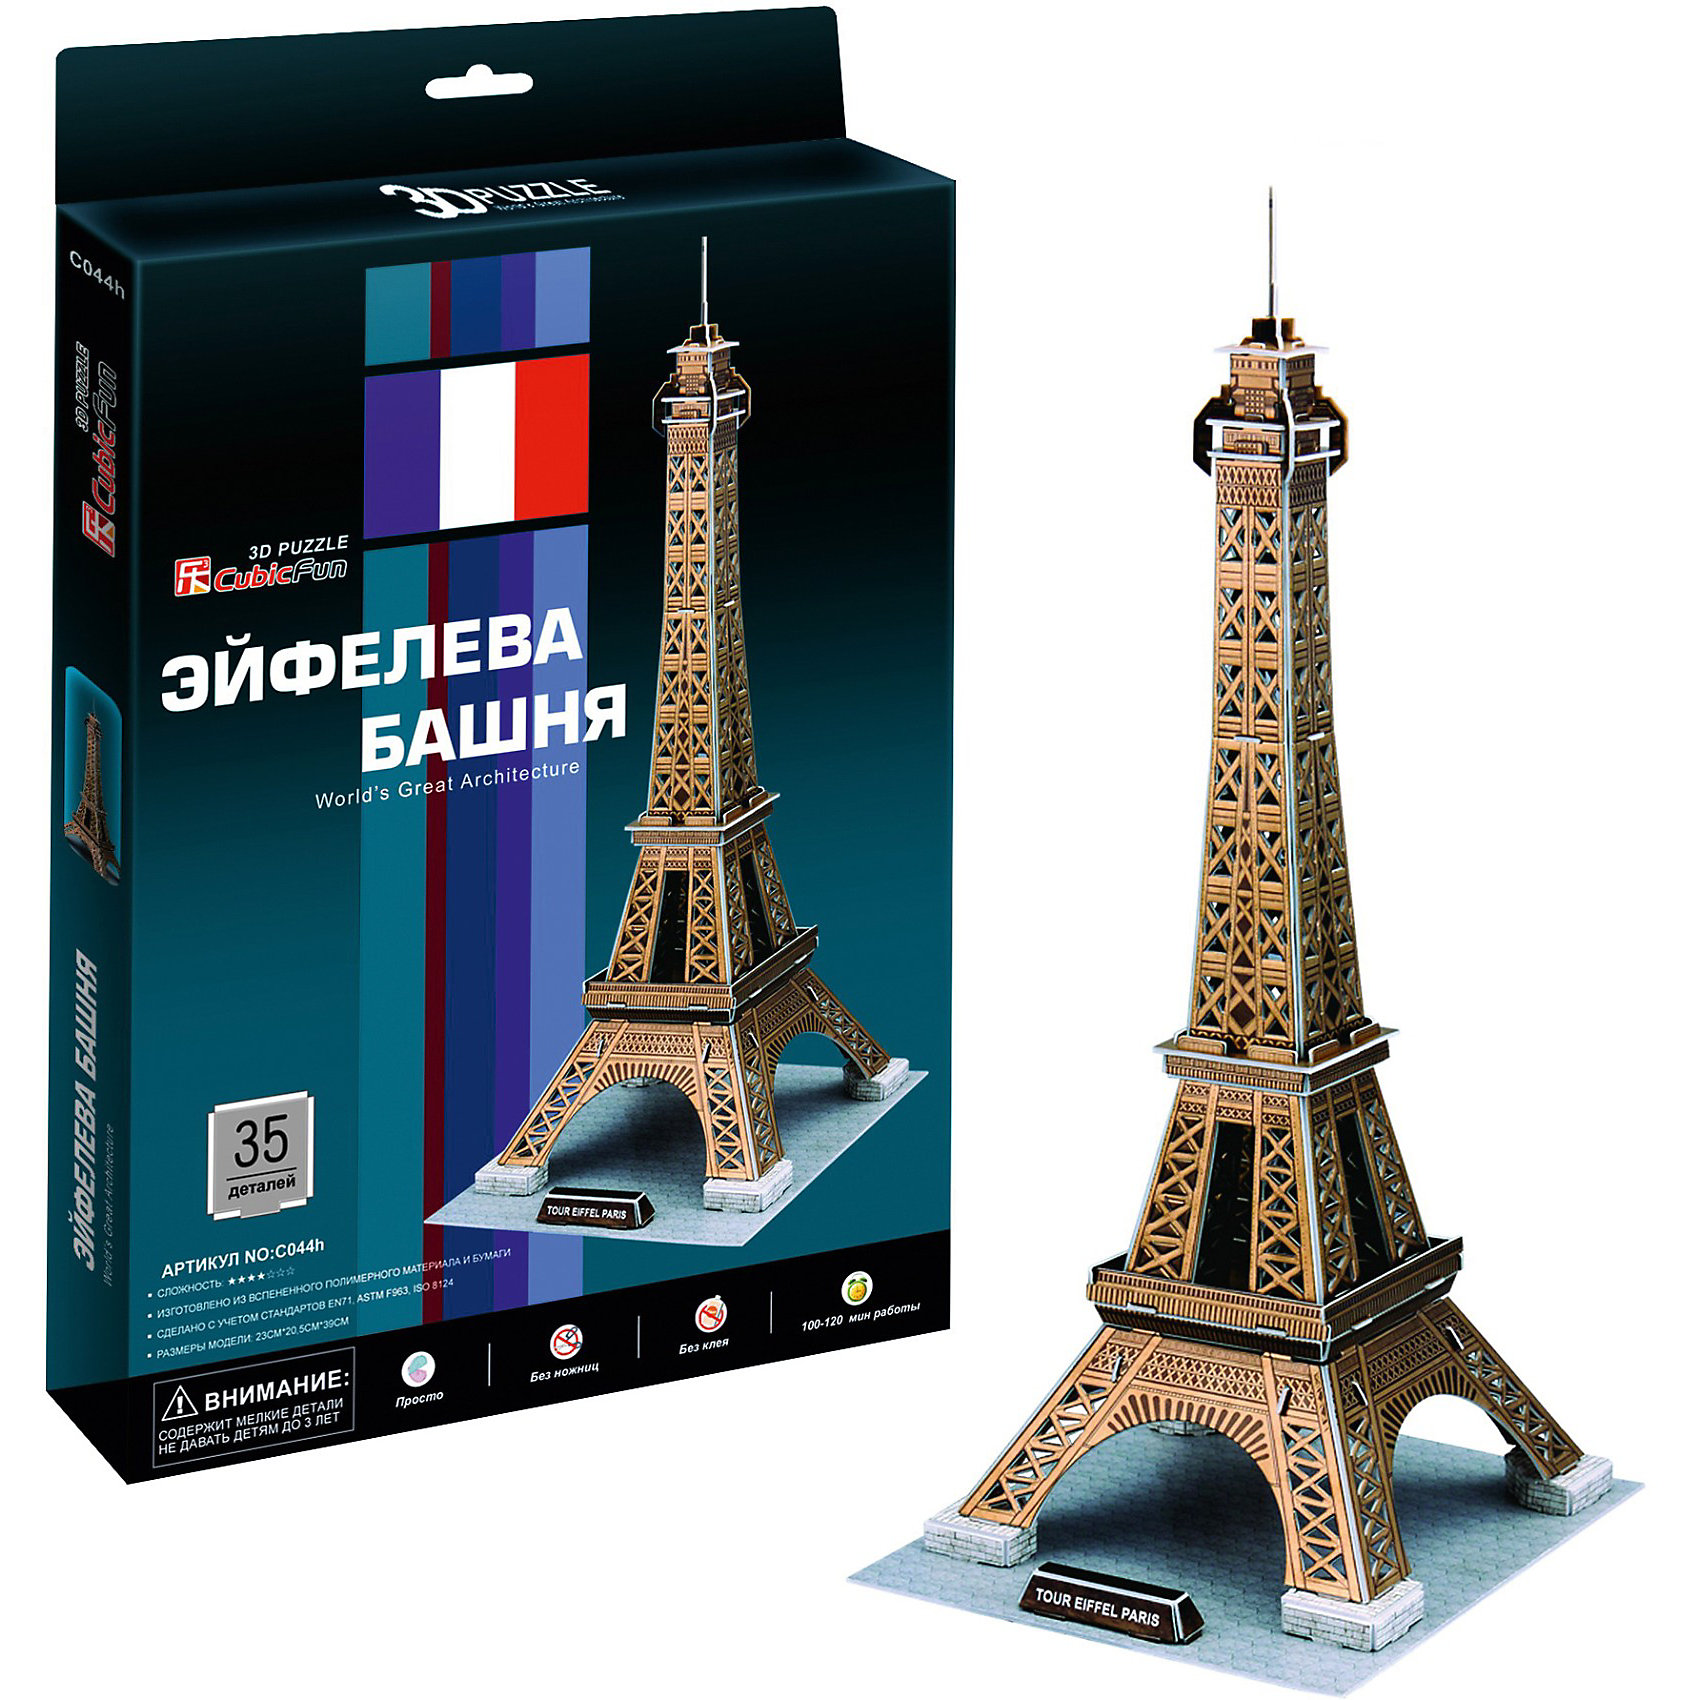 CubicFun Пазл 3D Эйфелева Башня (Париж), 35 деталей, CubicFun cubicfun 3d пазл эйфелева башня 2 франция cubicfun 33 детали